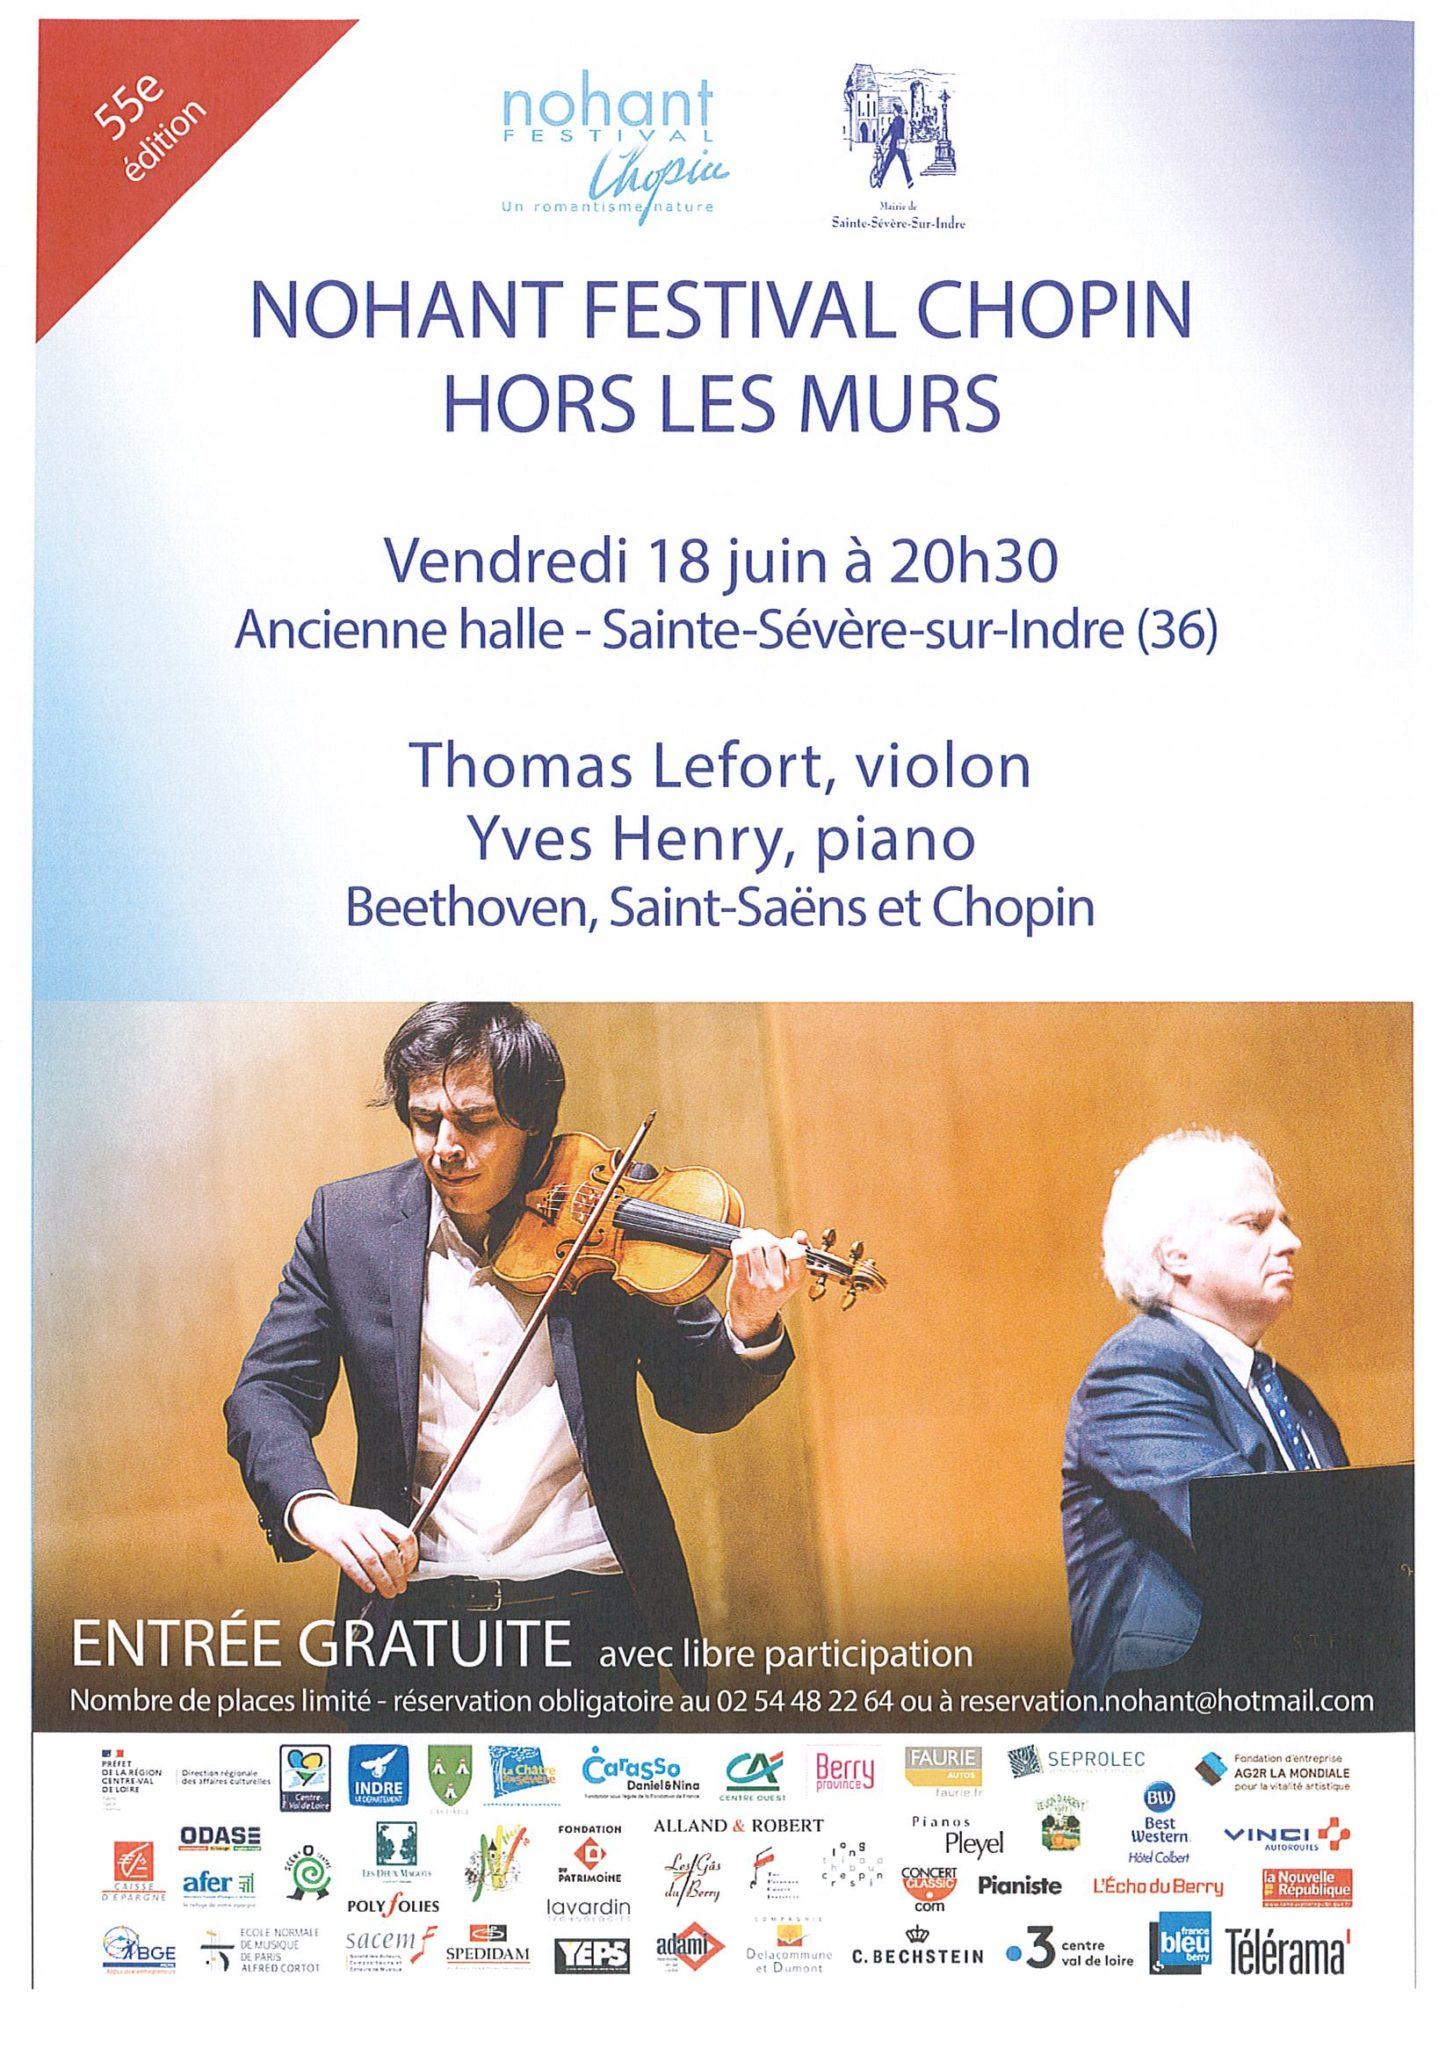 Vendredi 18 juin -Nohant festival Chopin Hors les murs